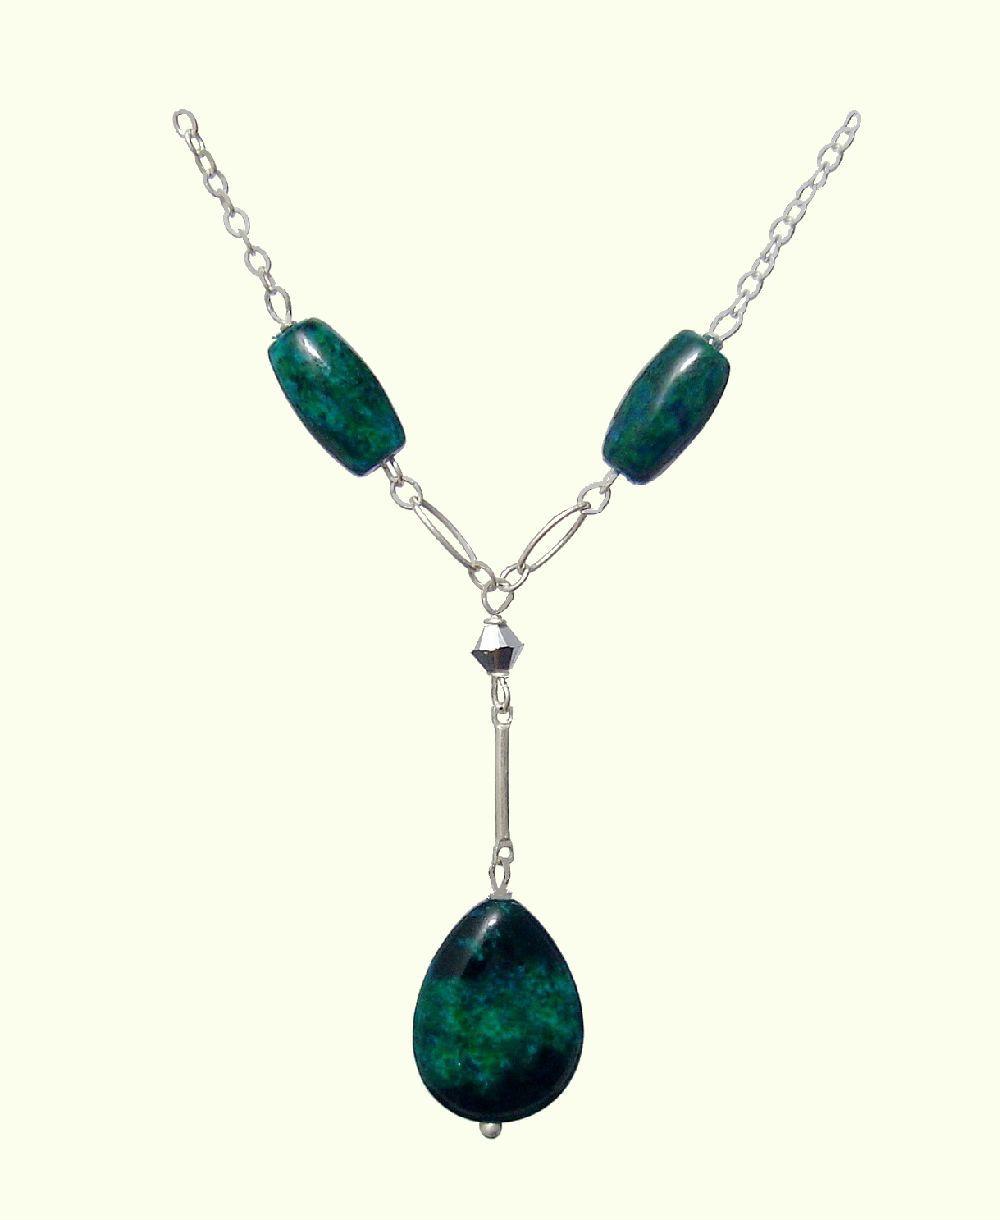 Chrysocolla blue green teardrop 925 sterling silver necklace chrysocolla blue green teardrop 925 sterling silver necklace handmade natural stones jewelry aloadofball Choice Image